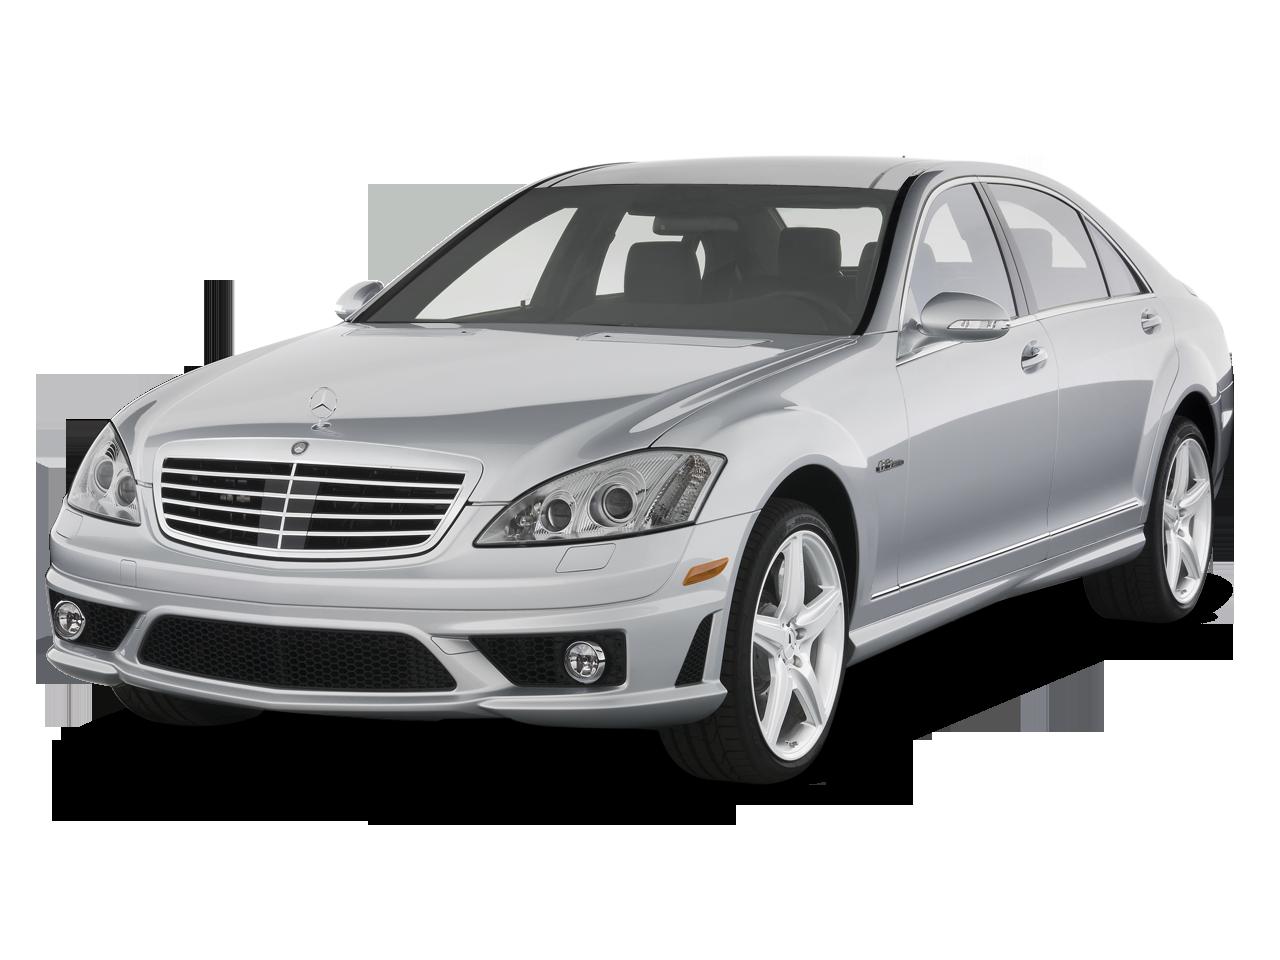 2009 mercedes benz s63 amg - mercedes benz luxury sedan review